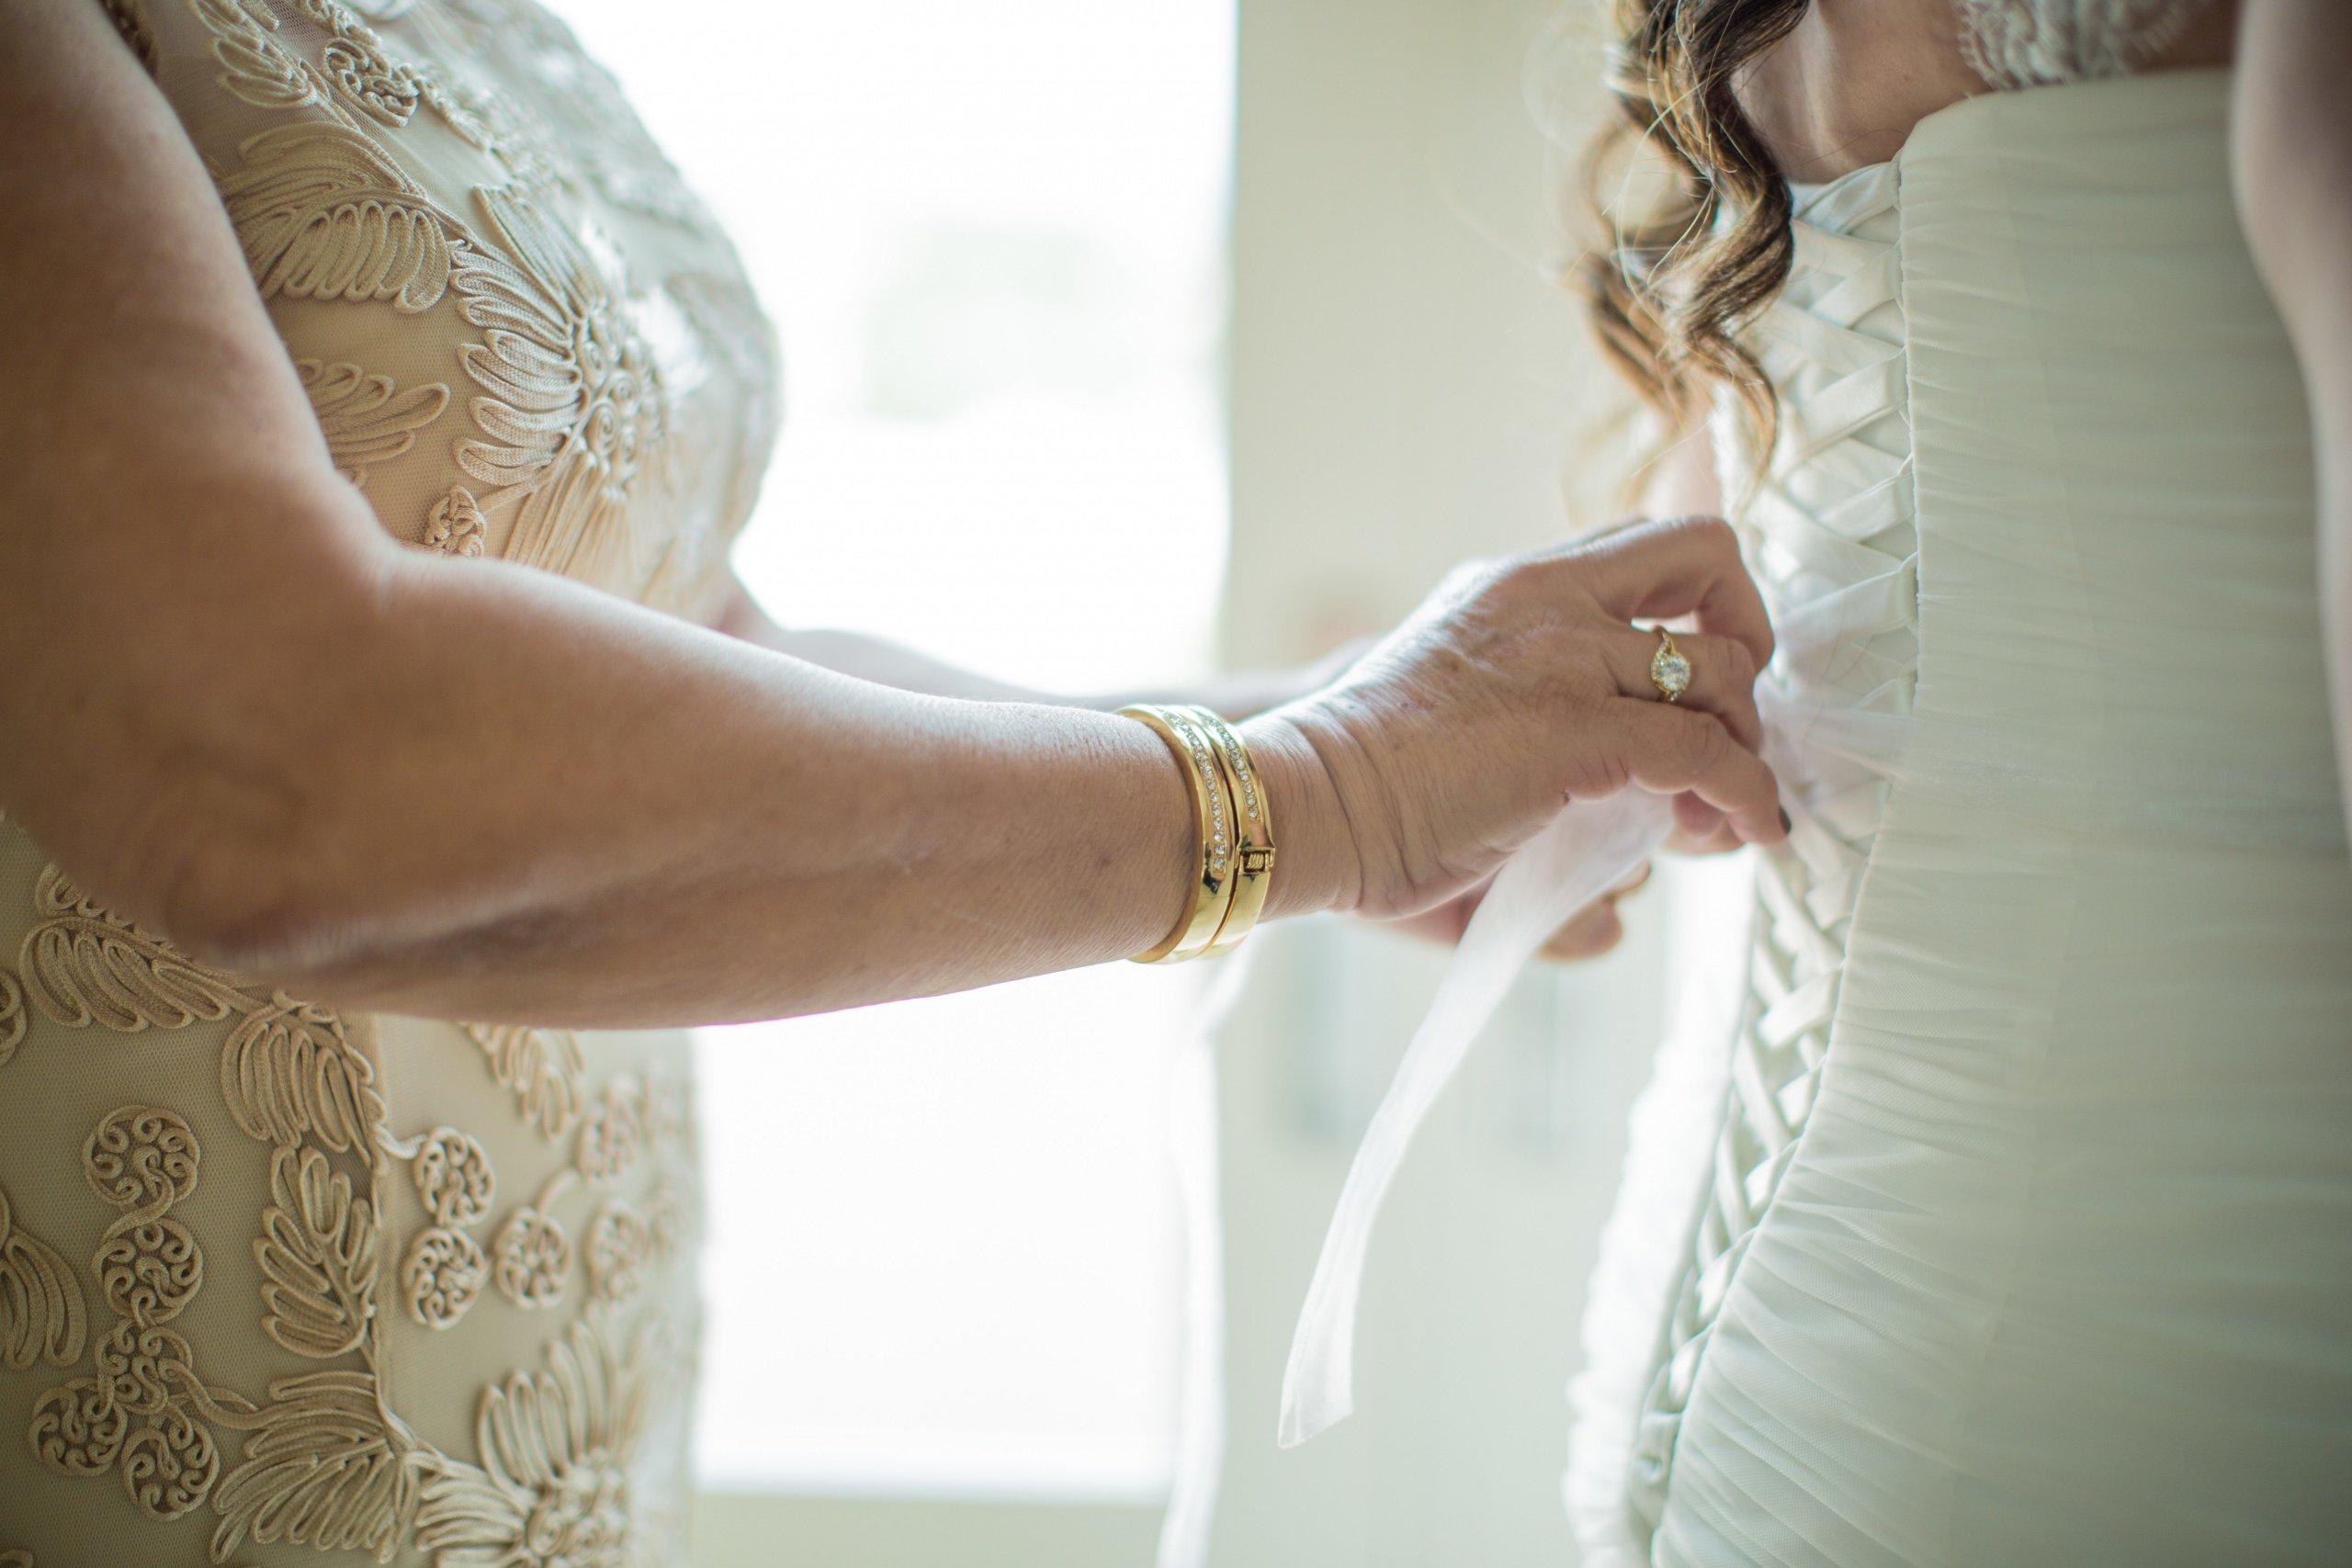 Tying a corset